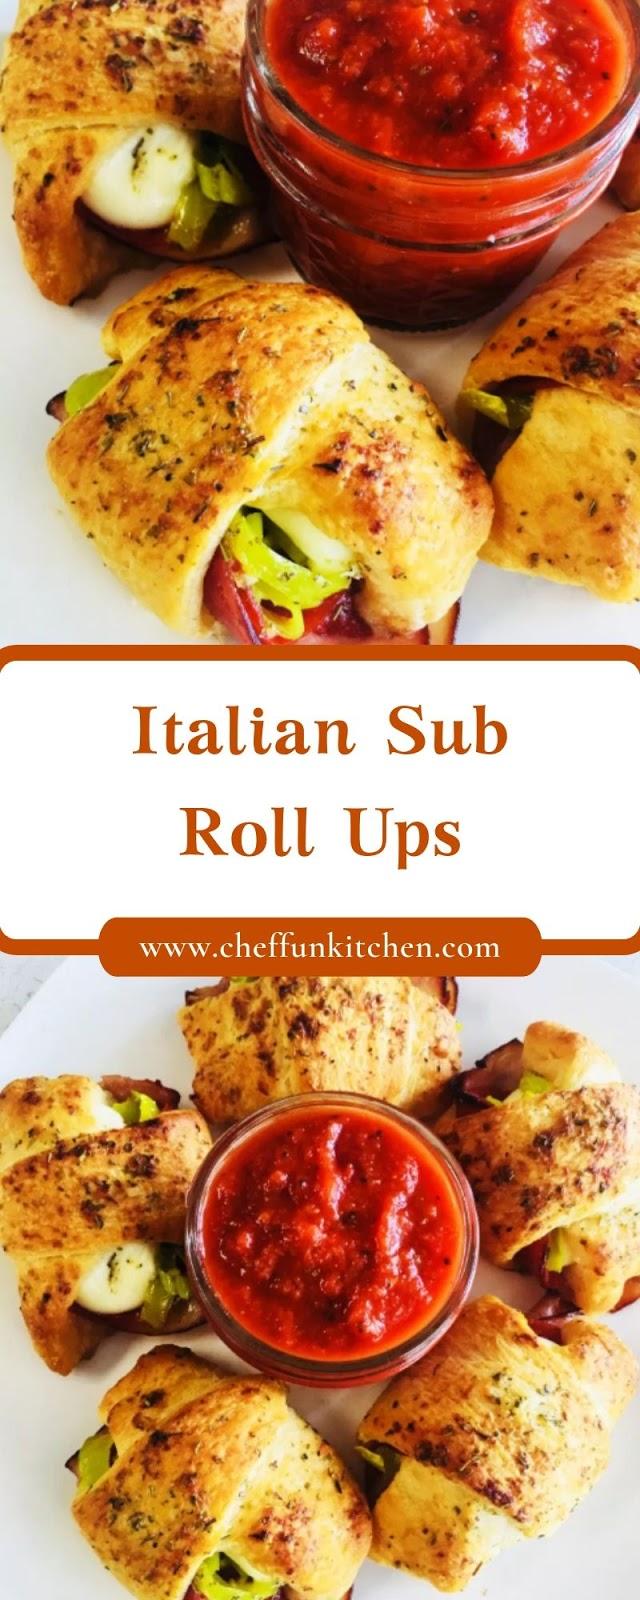 Italian Sub Roll Ups